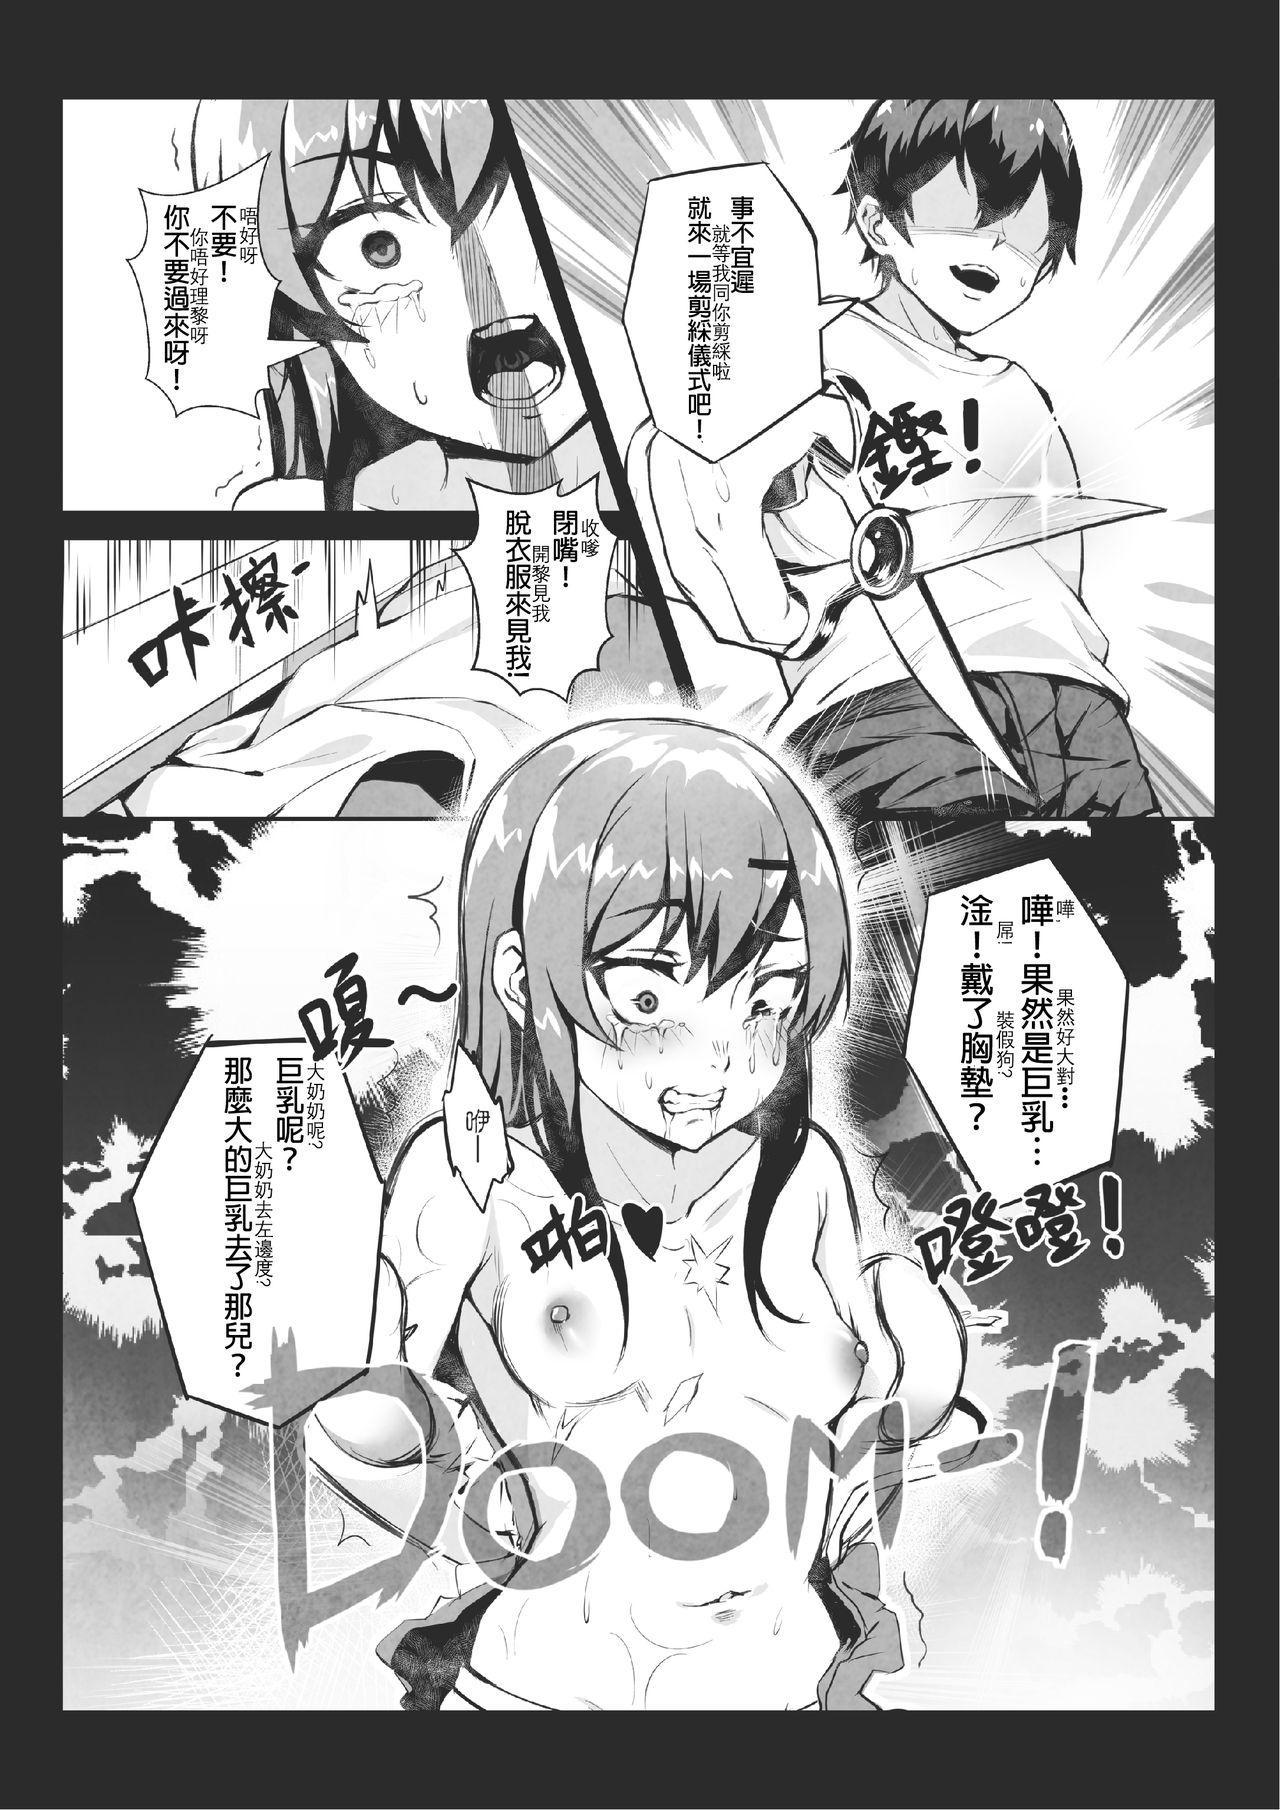 [Gantou Ikunoro] MK girl embodies the spirit of Hong Kong under the Lion Rock [Chinese]  [君廣東話本當上手機翻漢化組] v2 43